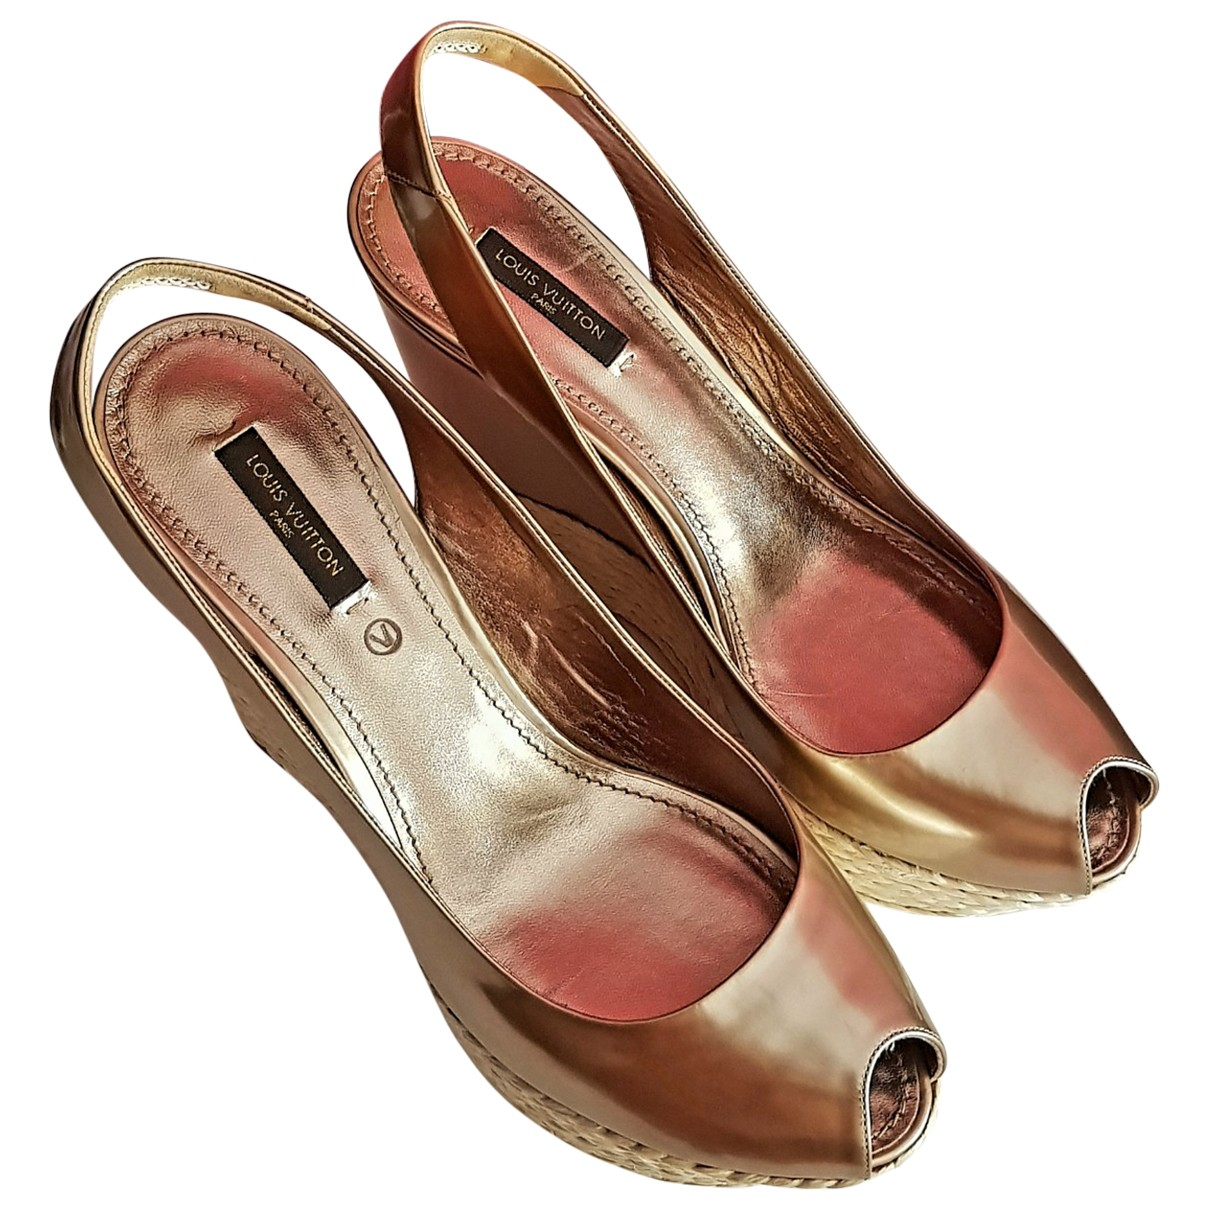 Louis Vuitton \N Metallic Patent leather Espadrilles for Women 40 EU